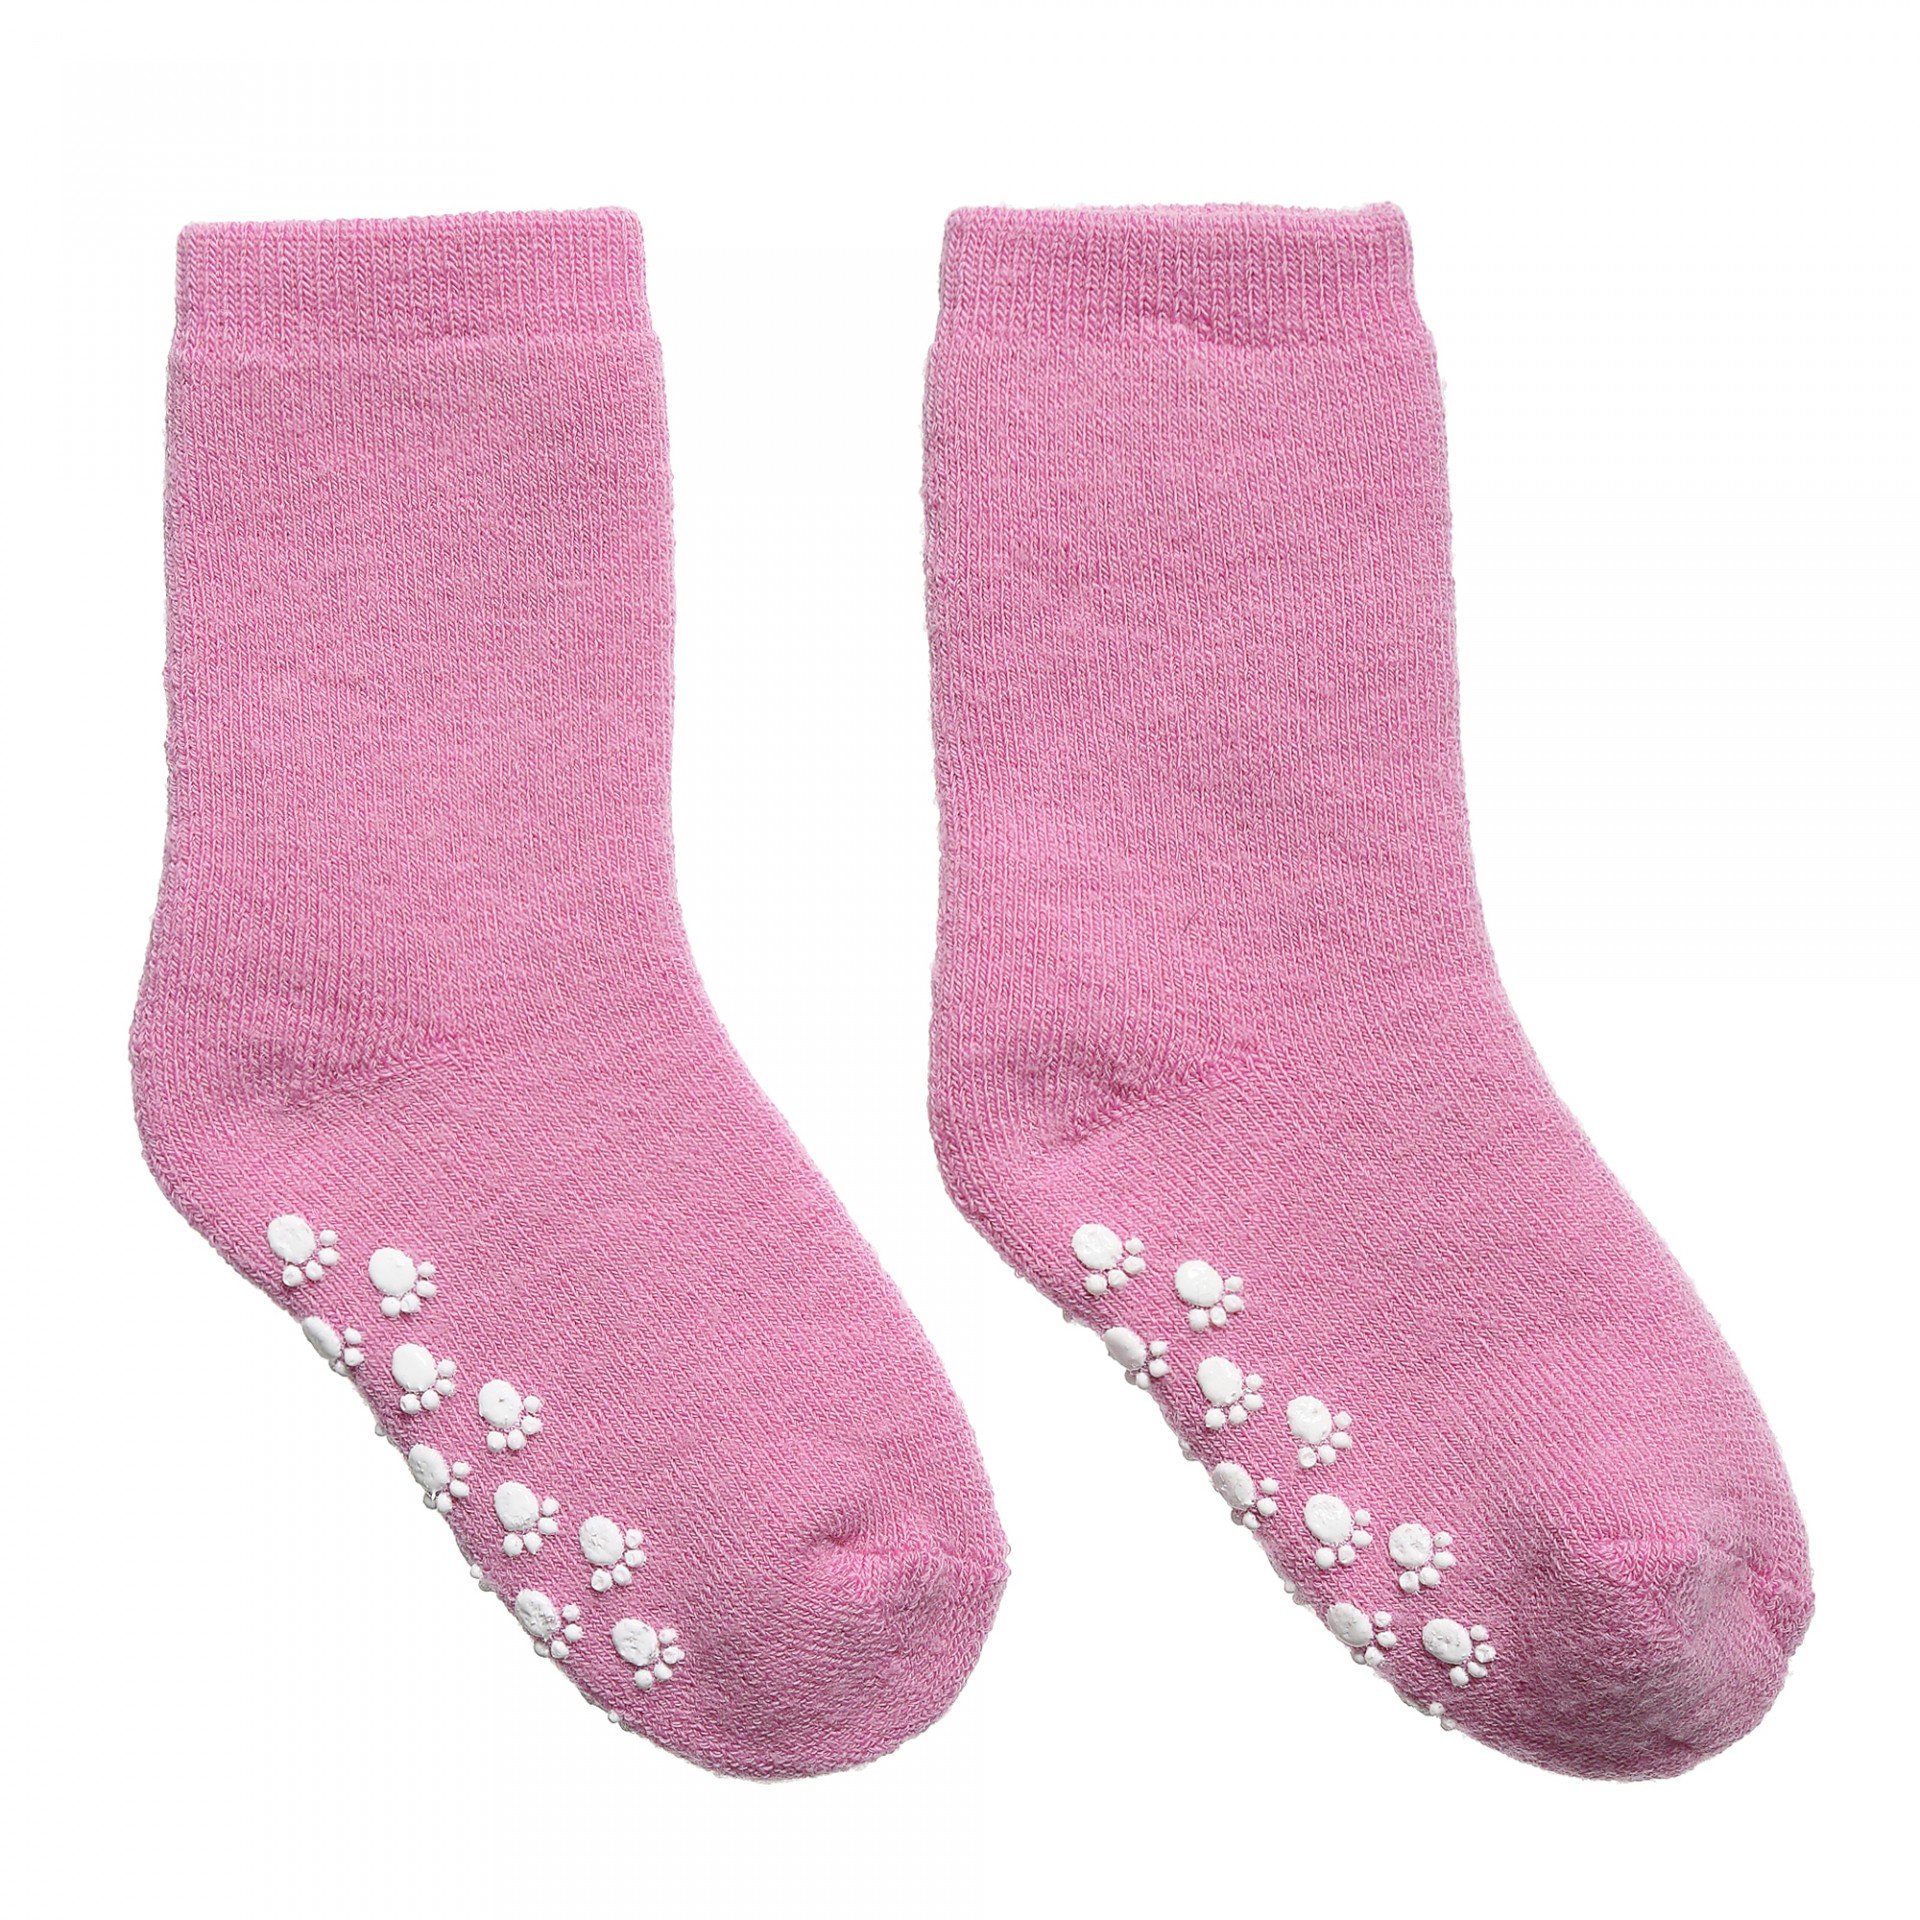 Meias de lã anti-derrapantes Pink JOHA